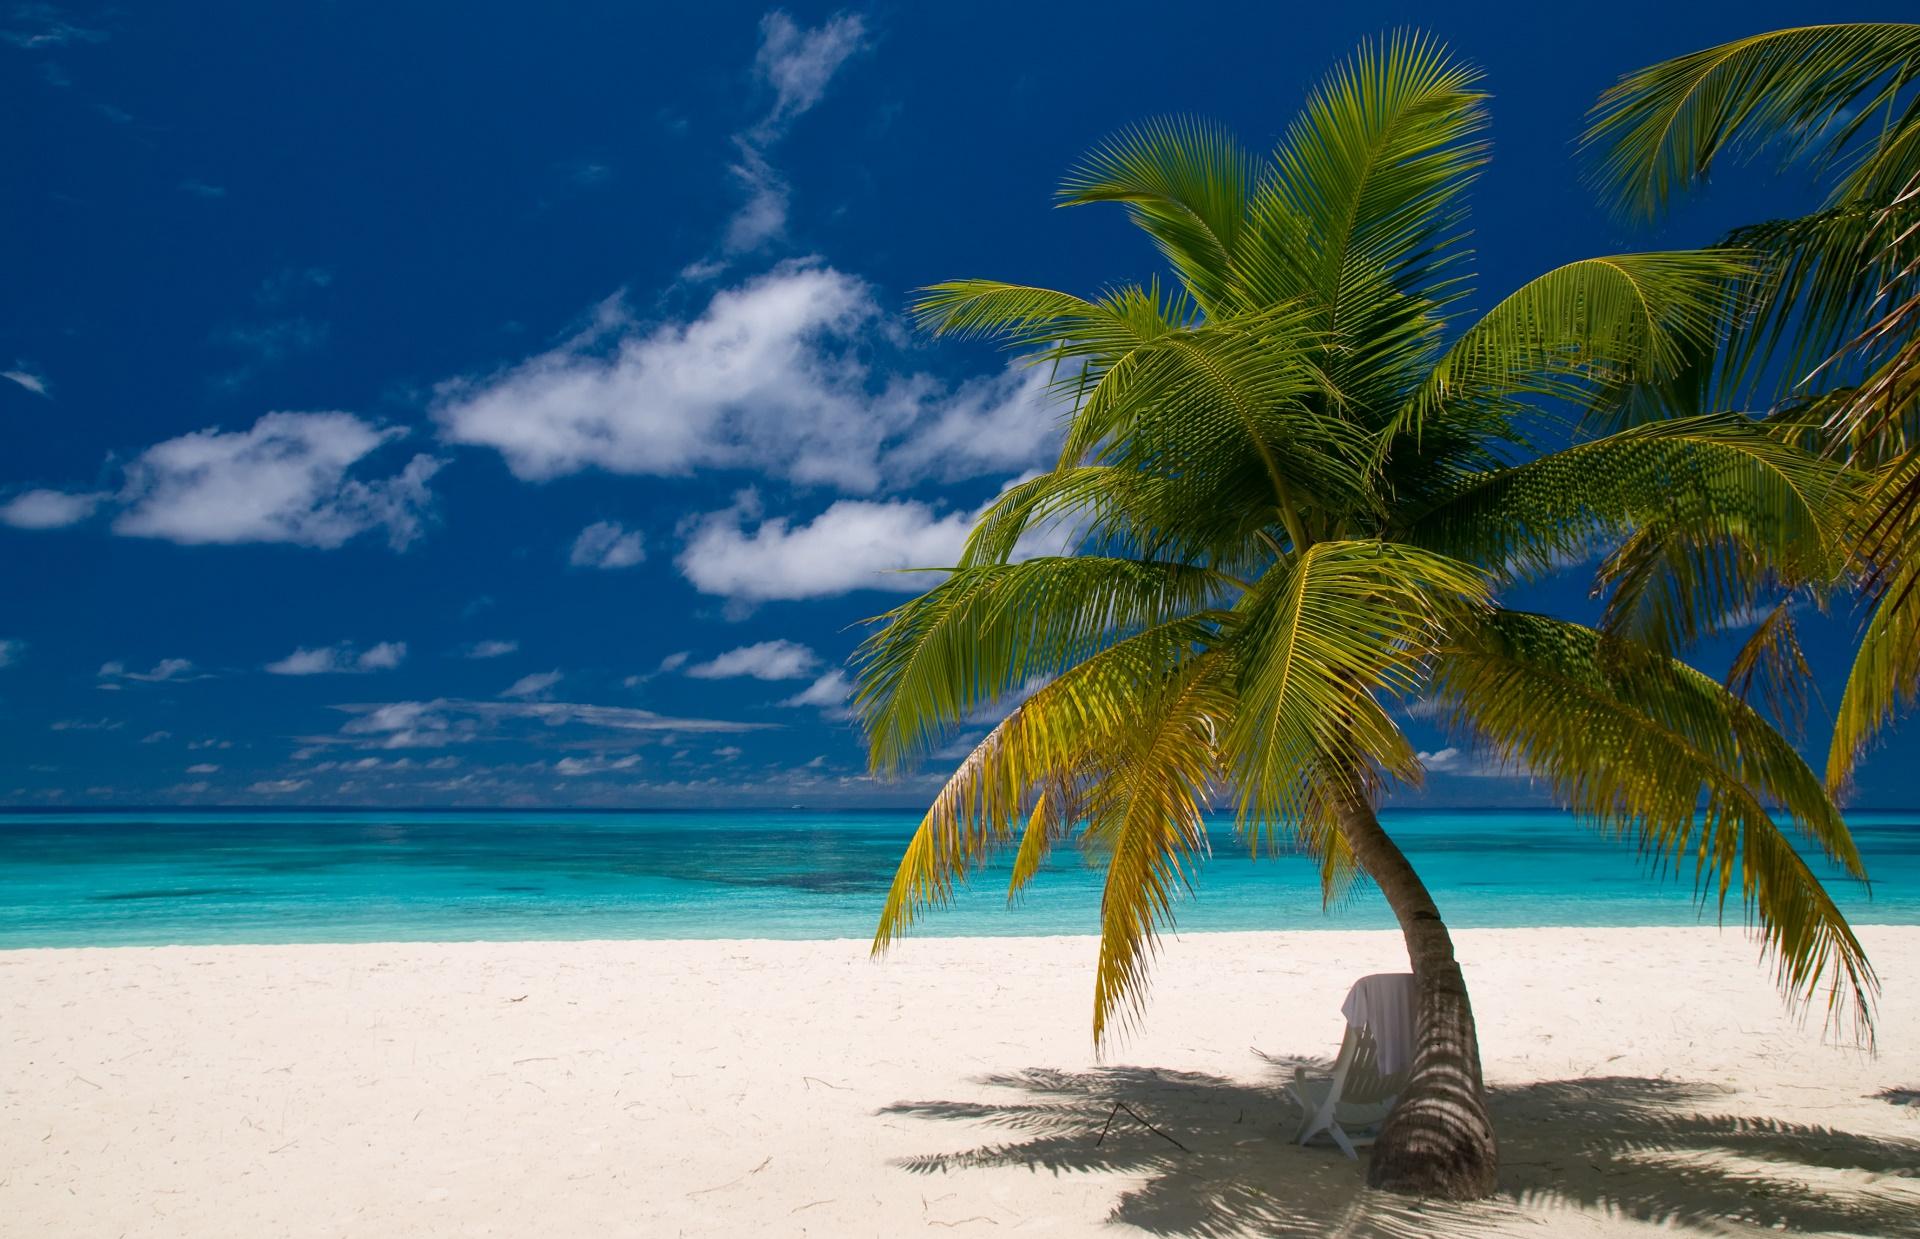 Beach HD Wallpaper | Background Image | 1920x1239 | ID